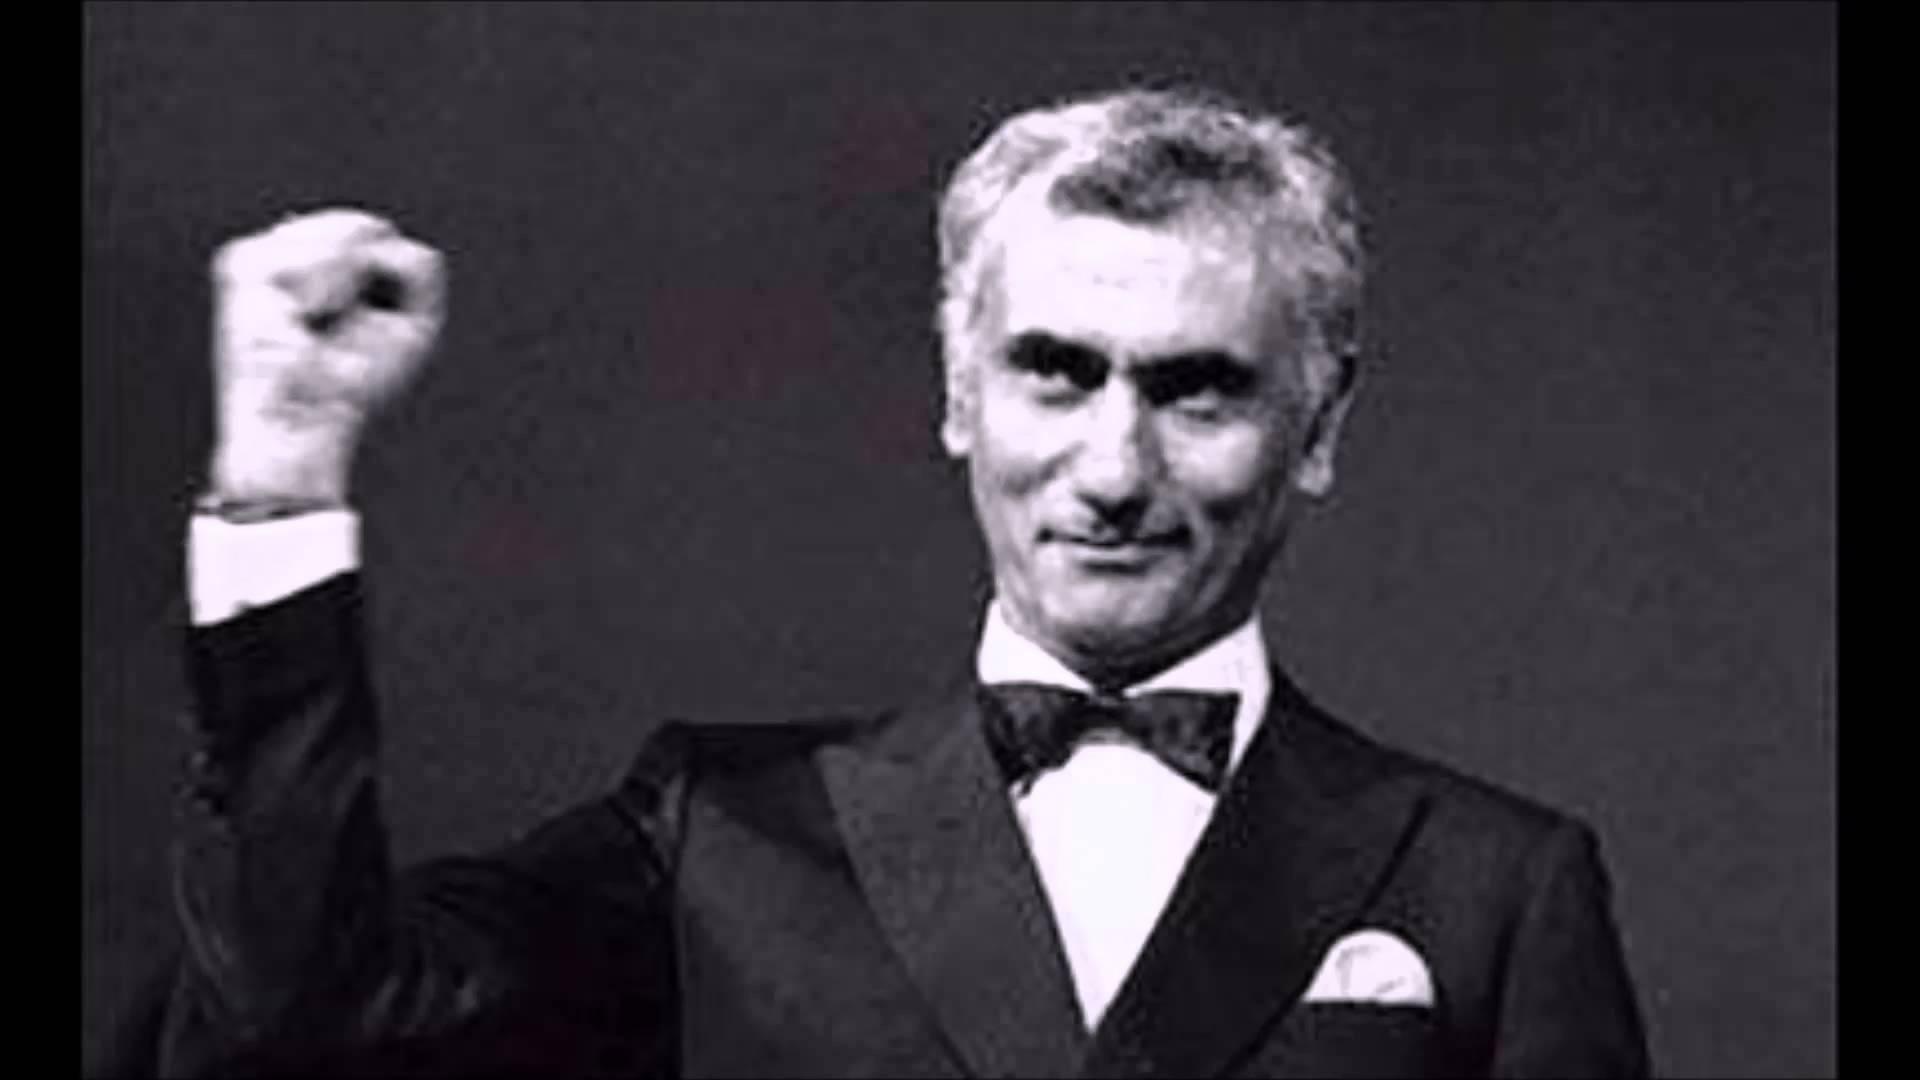 1 Nisan 1937 - İyi ki doğdun 'Çirkin Kral'